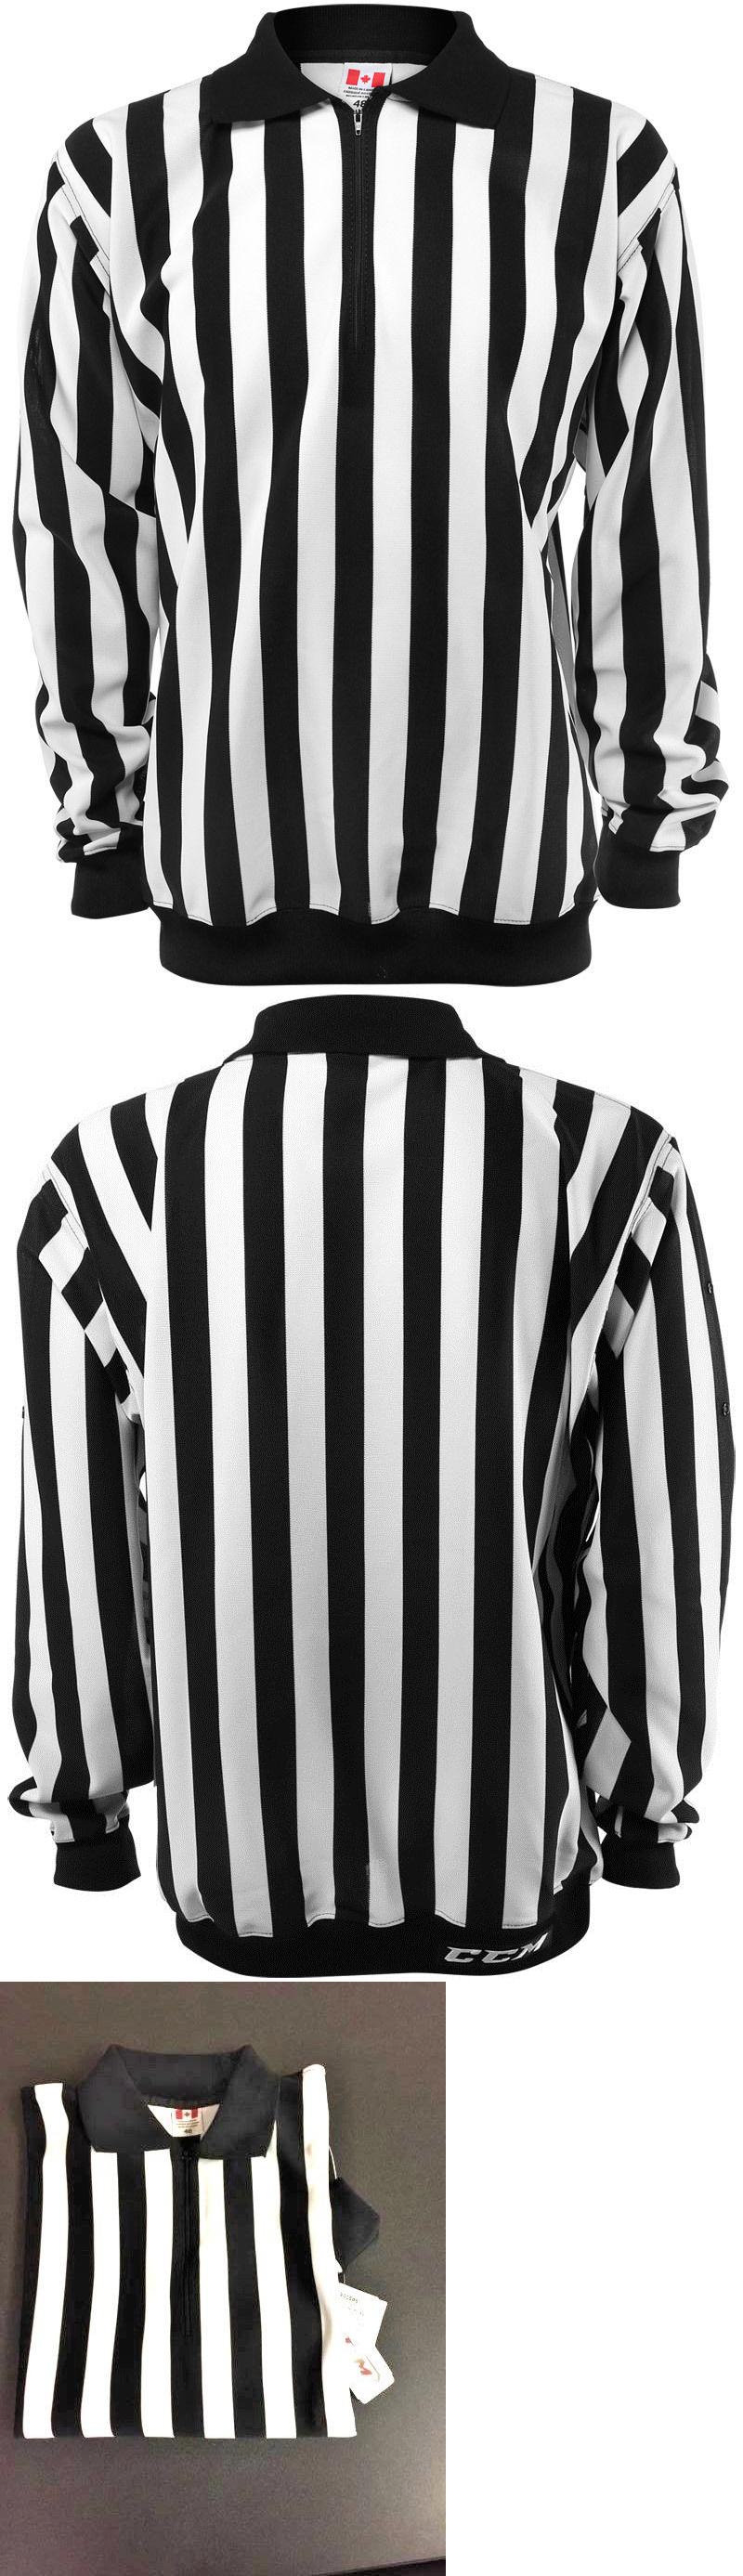 9b1e127d8 Men 159122  Ccm Pro 150S Hockey Referee Jersey -  Free Shipping ...